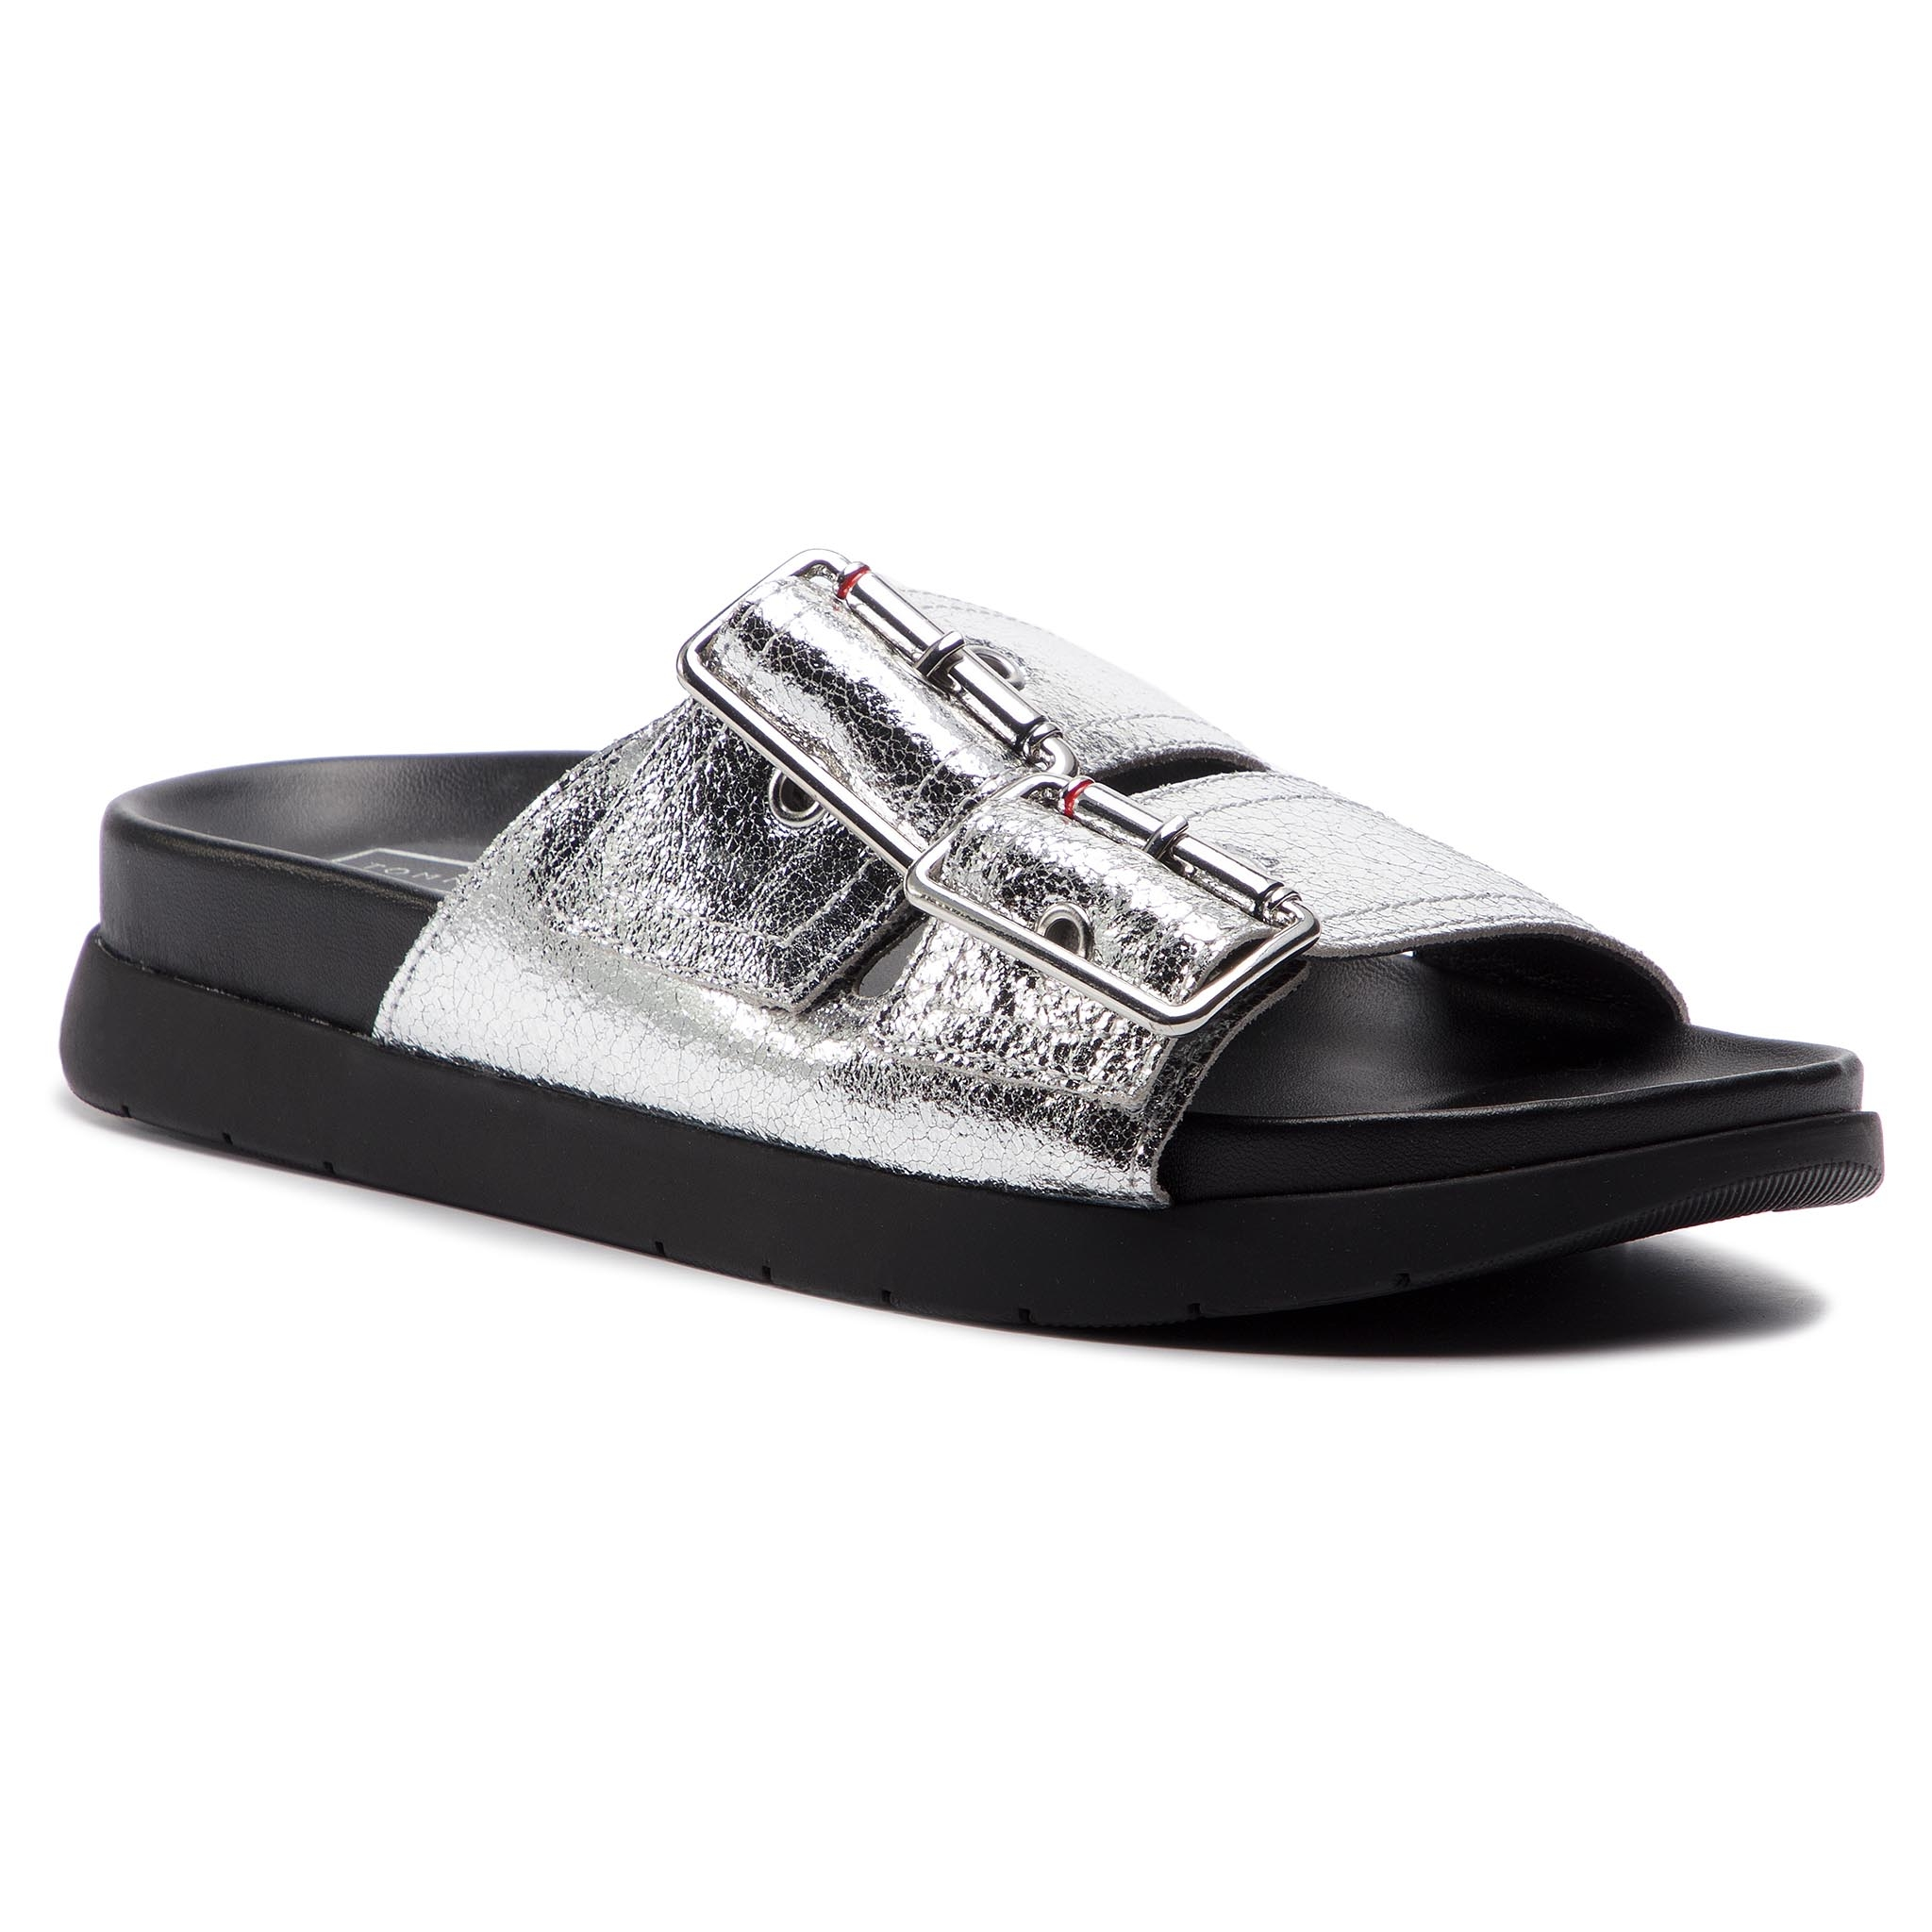 e1e0b6cb15 Papucs TOMMY HILFIGER - Crackle Metallic Footbed Sandal FW0FW03805 Silver  000